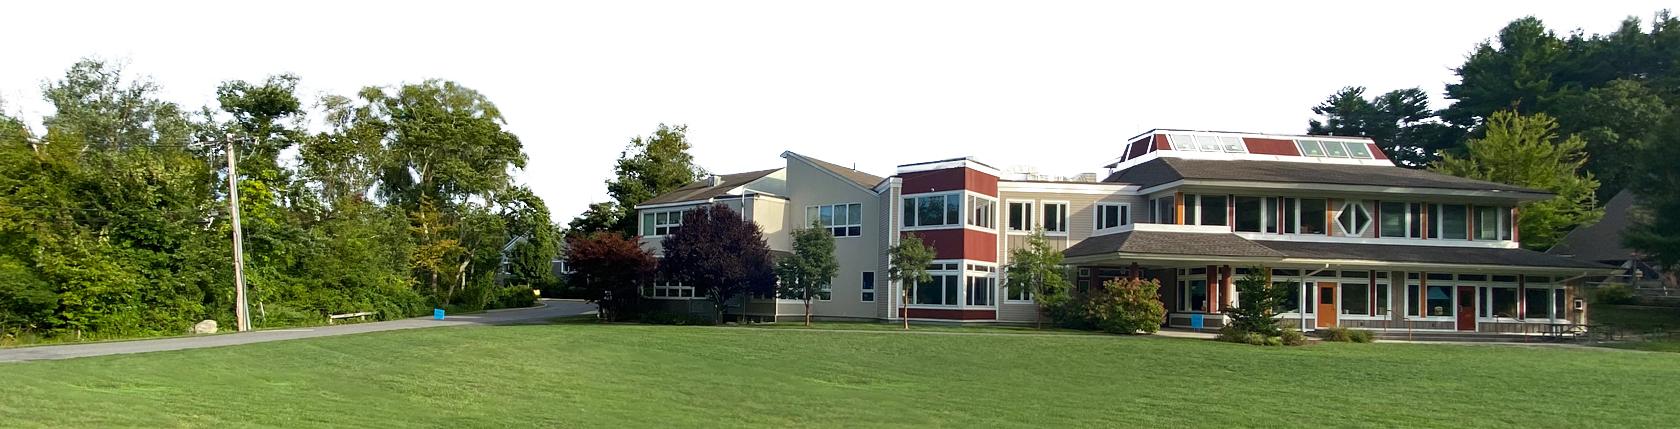 Dedham School Exterior